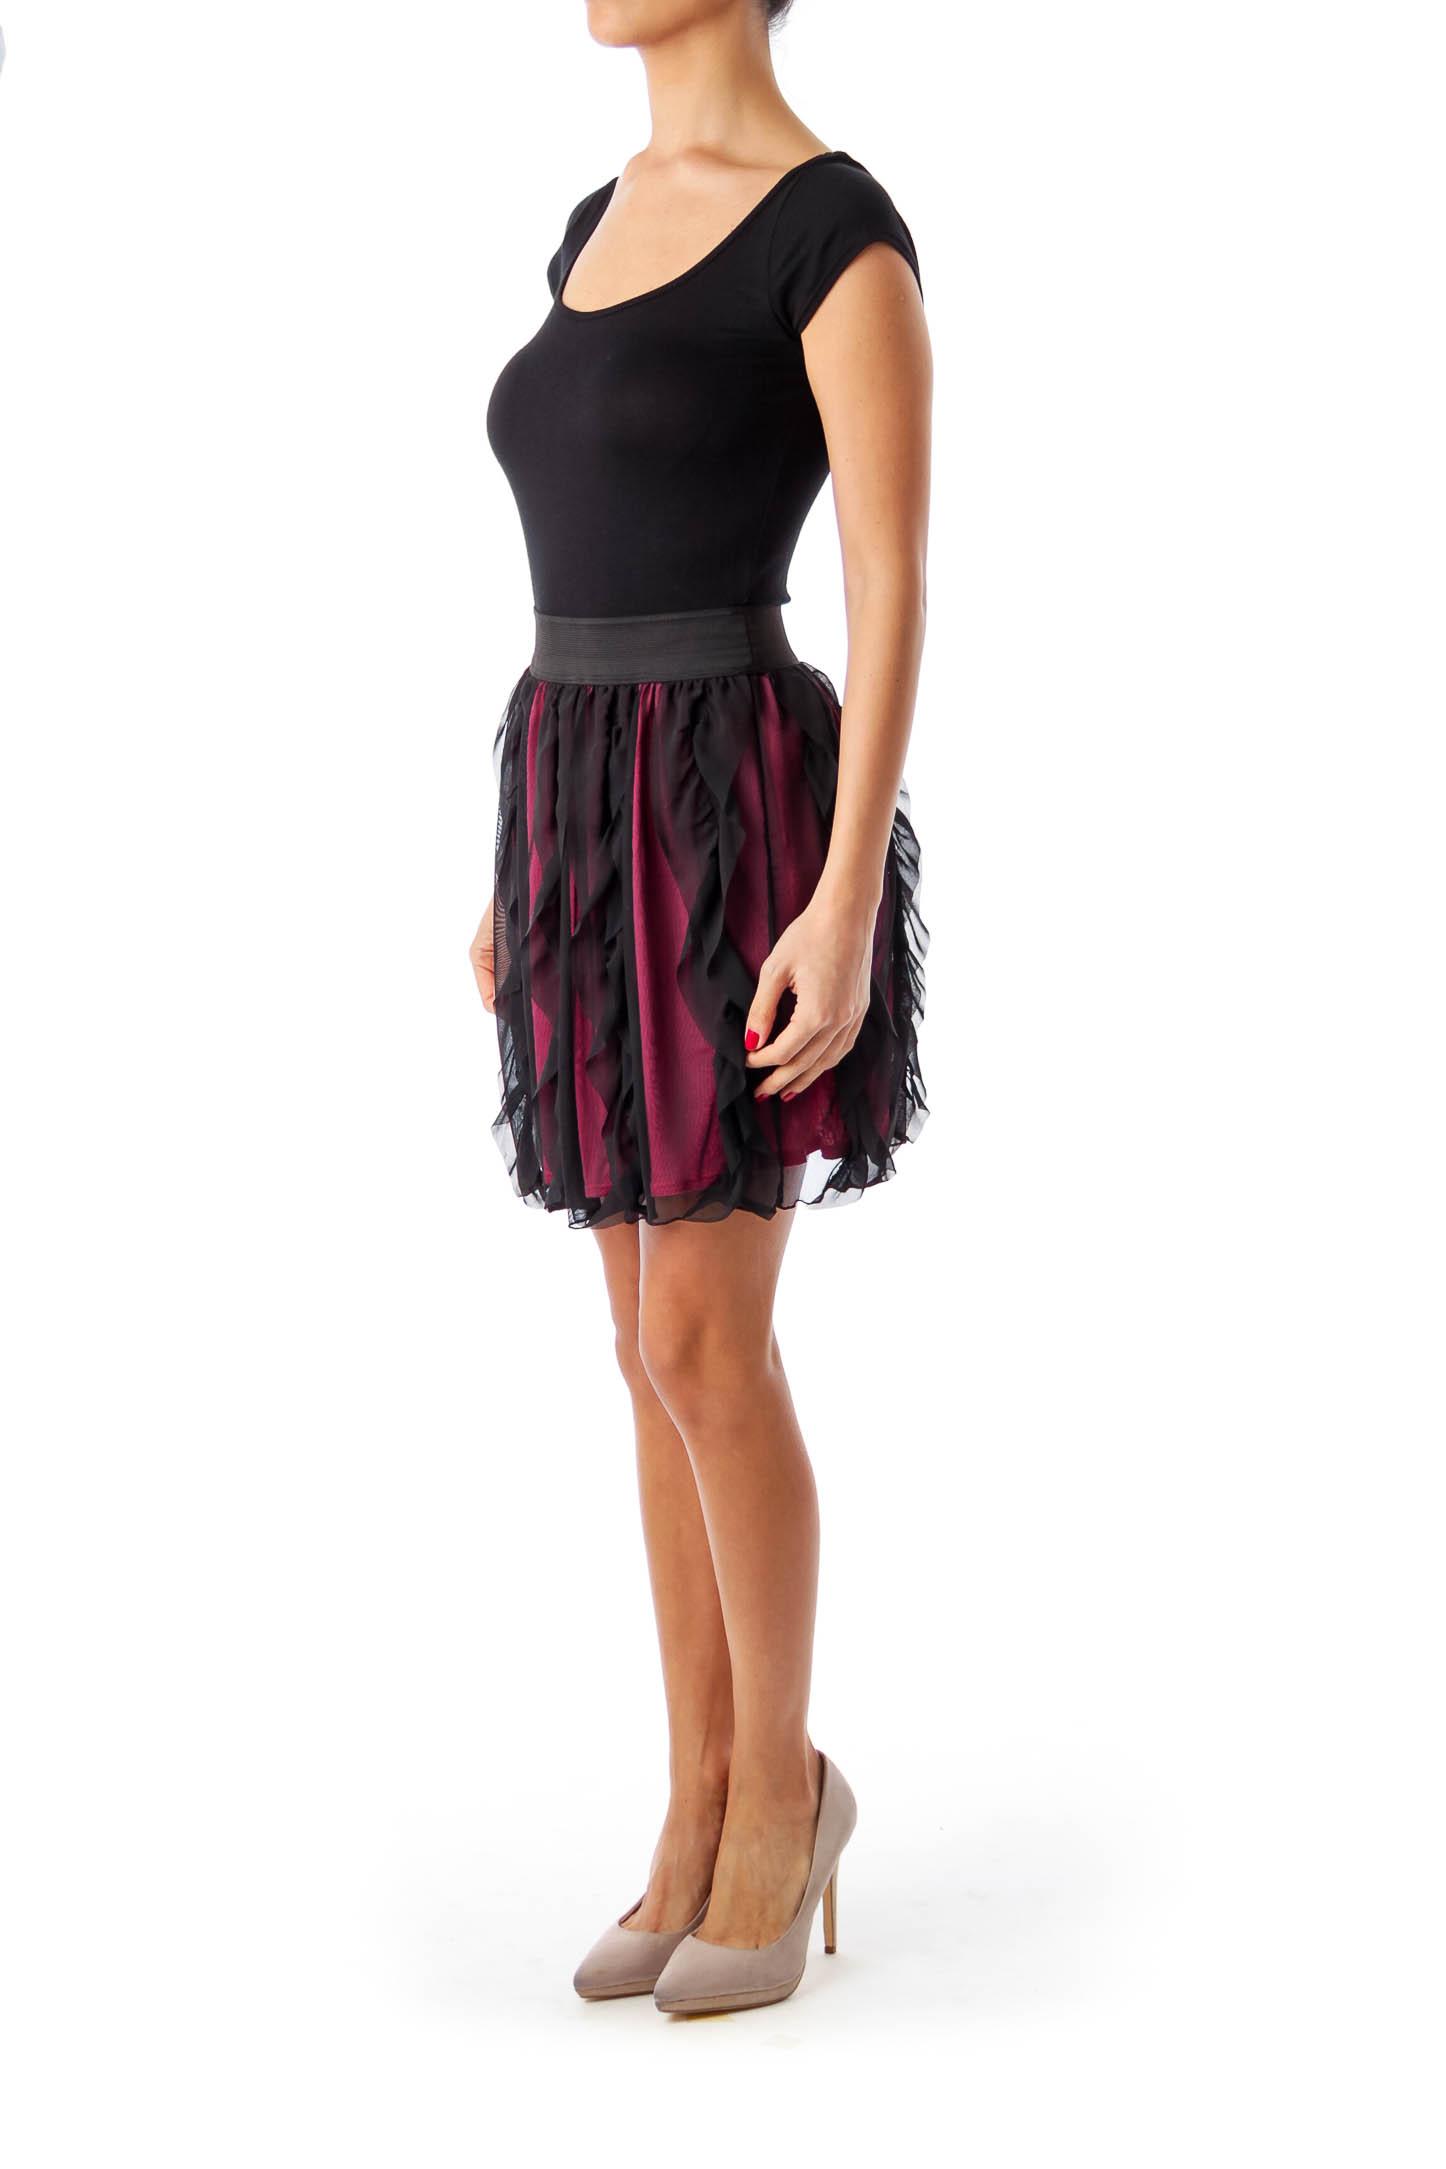 Black Elastic Waist Layered Dress